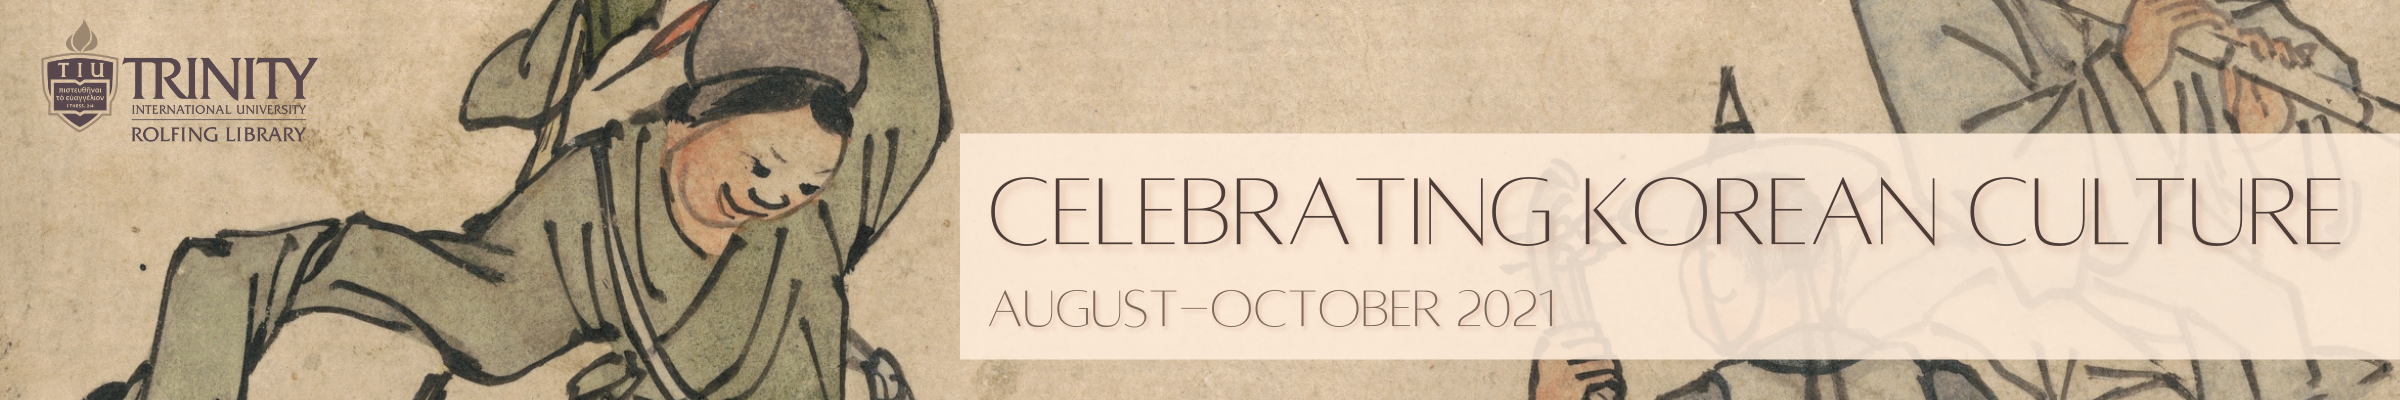 Celebrating Korean Culture August-October 2021